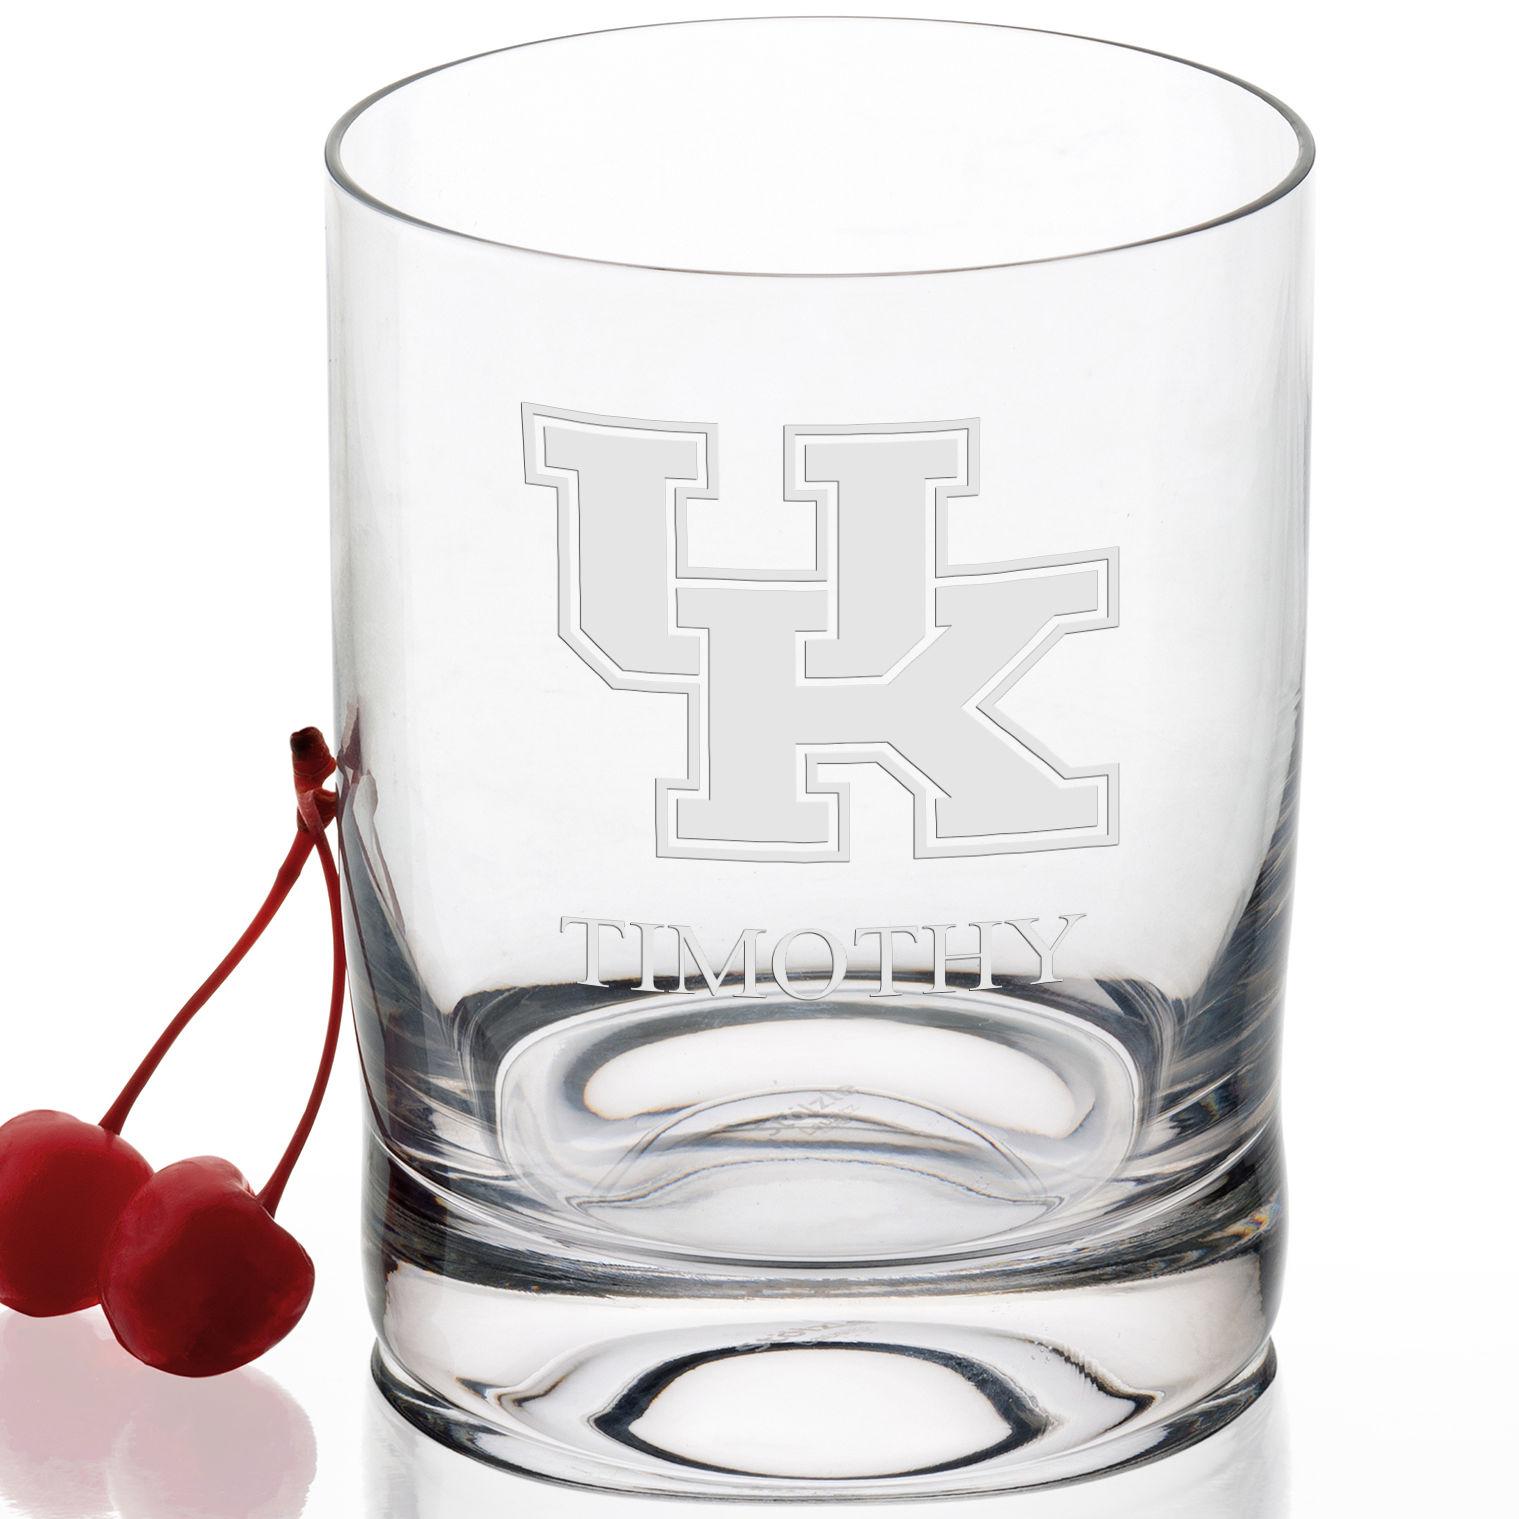 University of Kentucky Tumbler Glasses - Set of 2 - Image 2